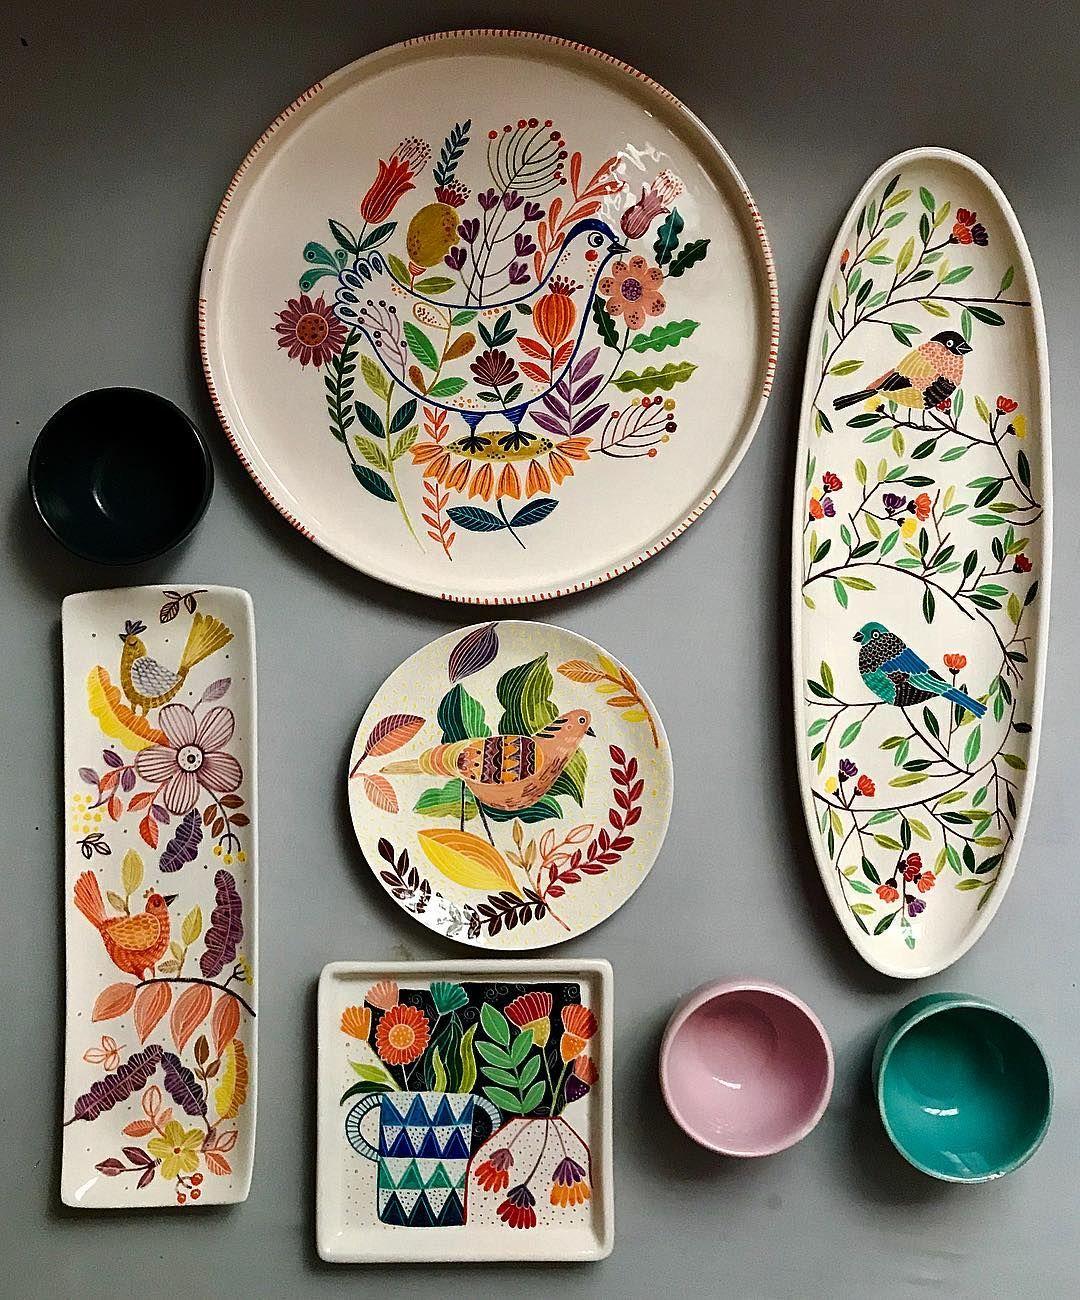 Shohrehhaghighi59 Ceramic Pottery Underglazepainting Iranianartist Shohrehhaghighi Instapottery Instacera Pottery Painting Designs Ceramic Studio Pottery Art